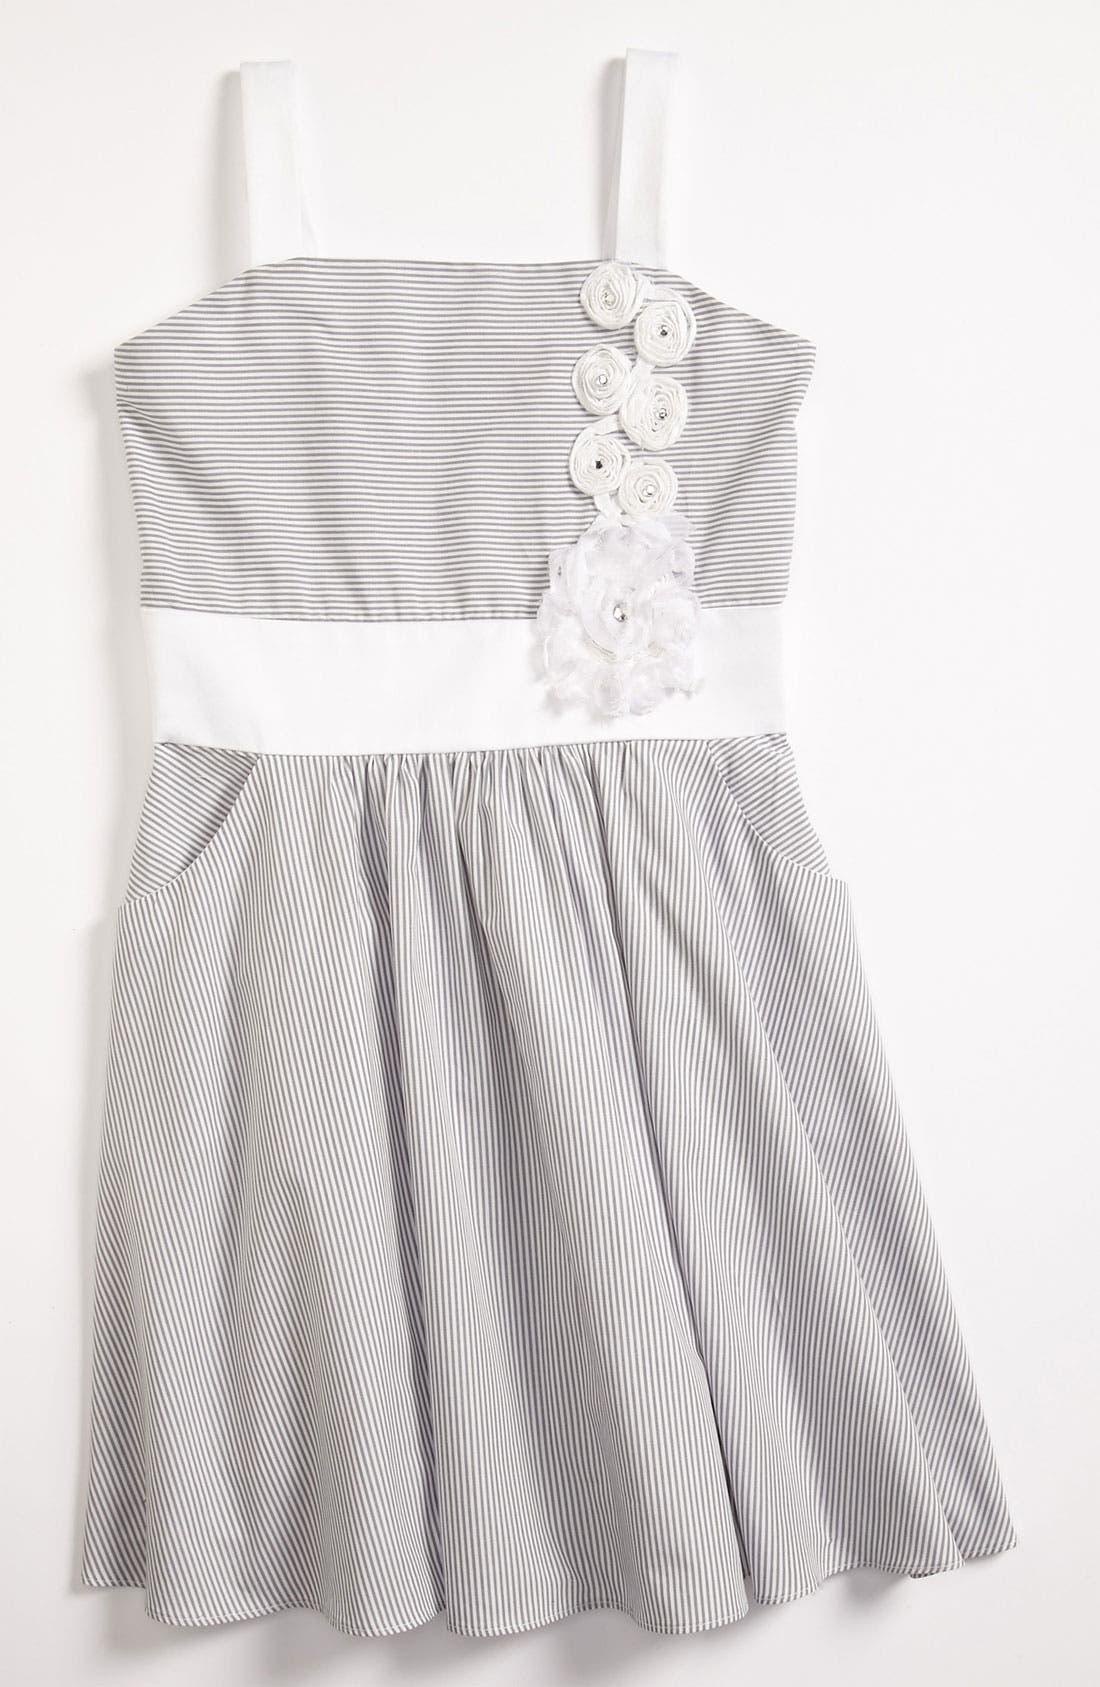 Alternate Image 1 Selected - Zoe Ltd Stripe Dress (Big Girls)